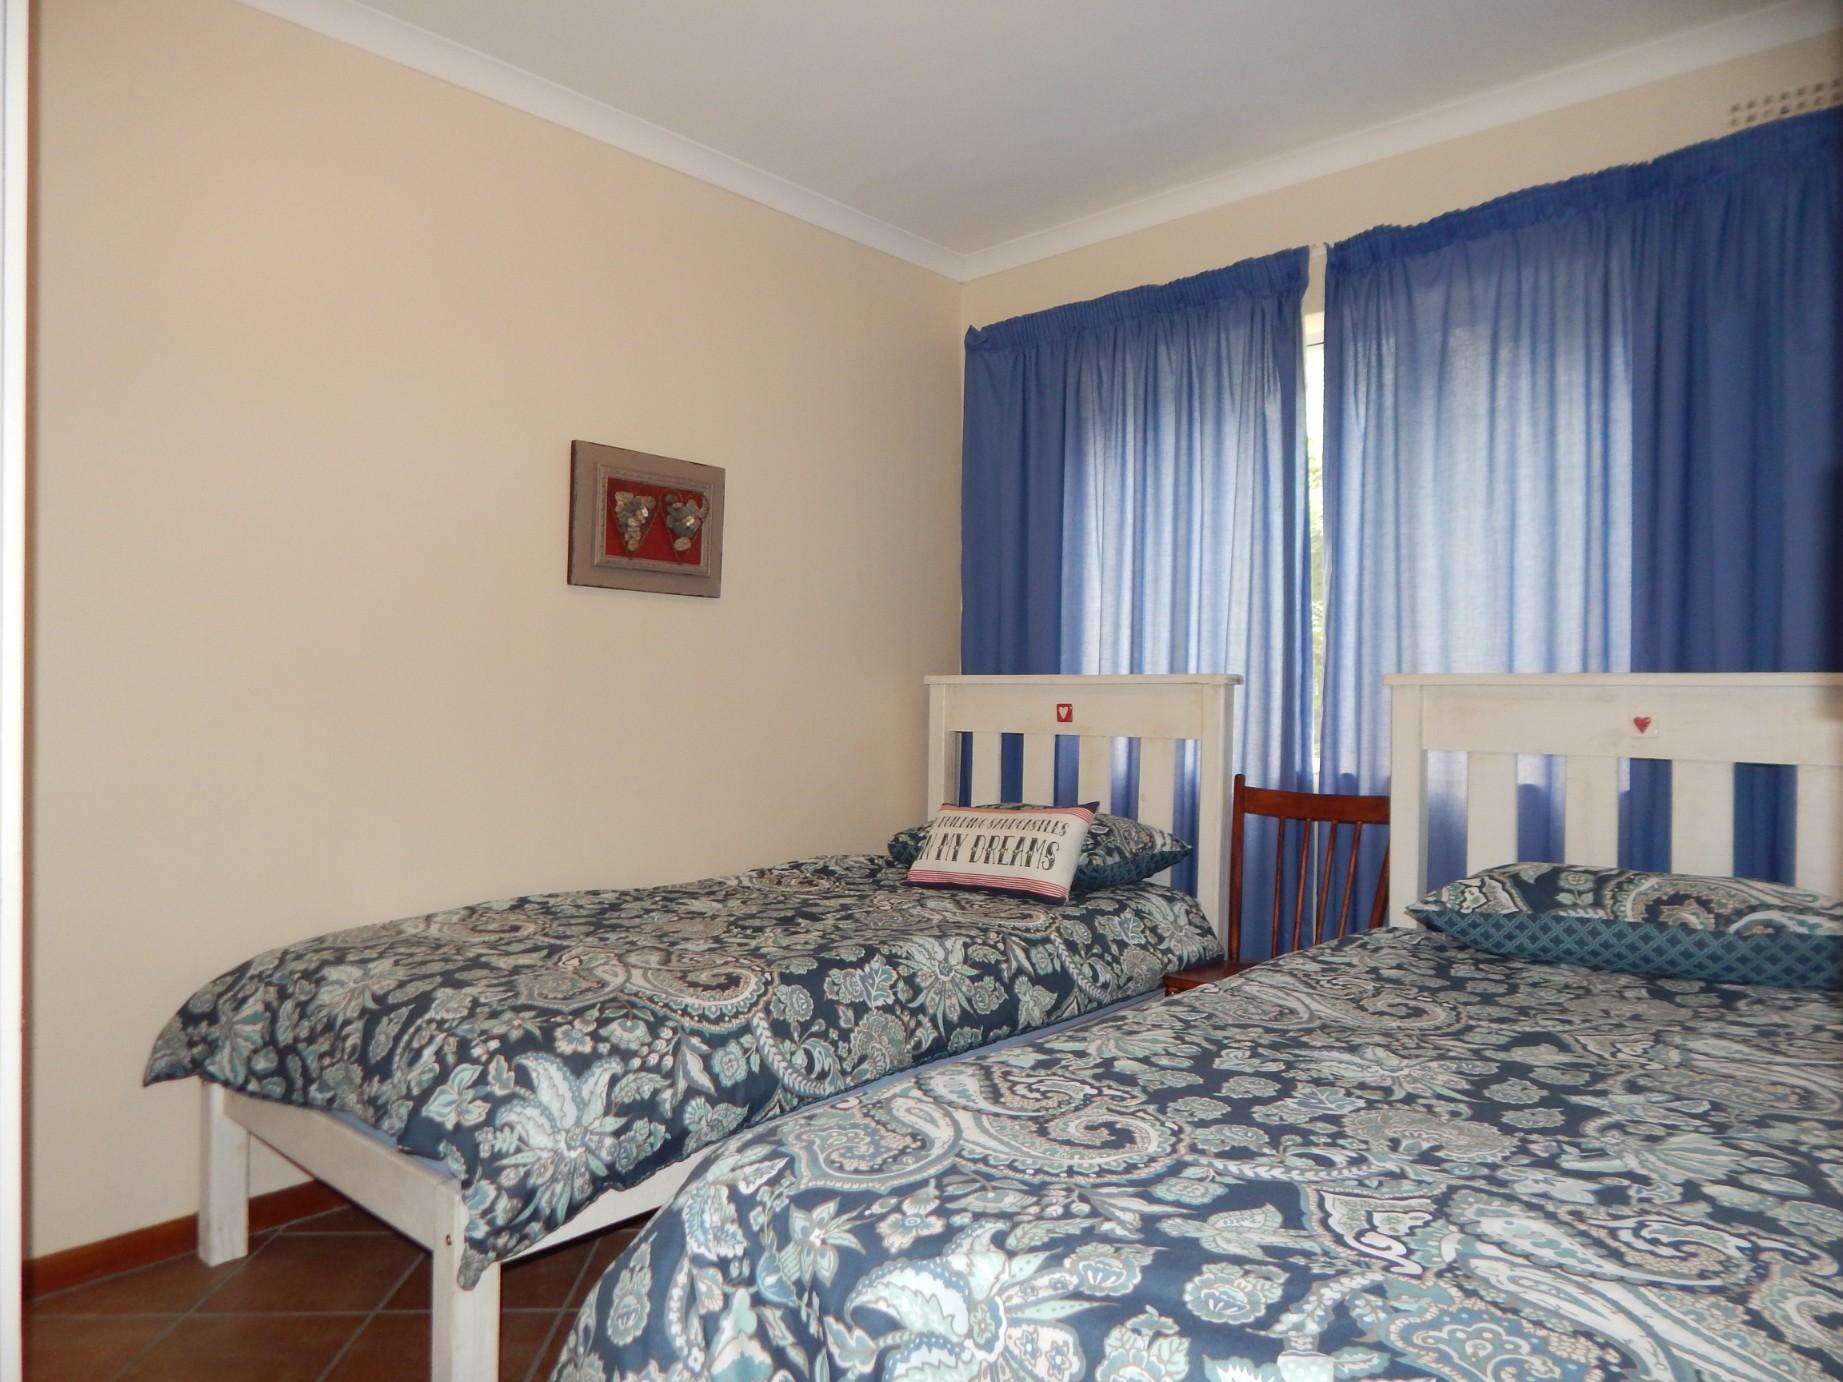 3 Bedroom Apartment for sale in De Bakke ENT0066483 : photo#19